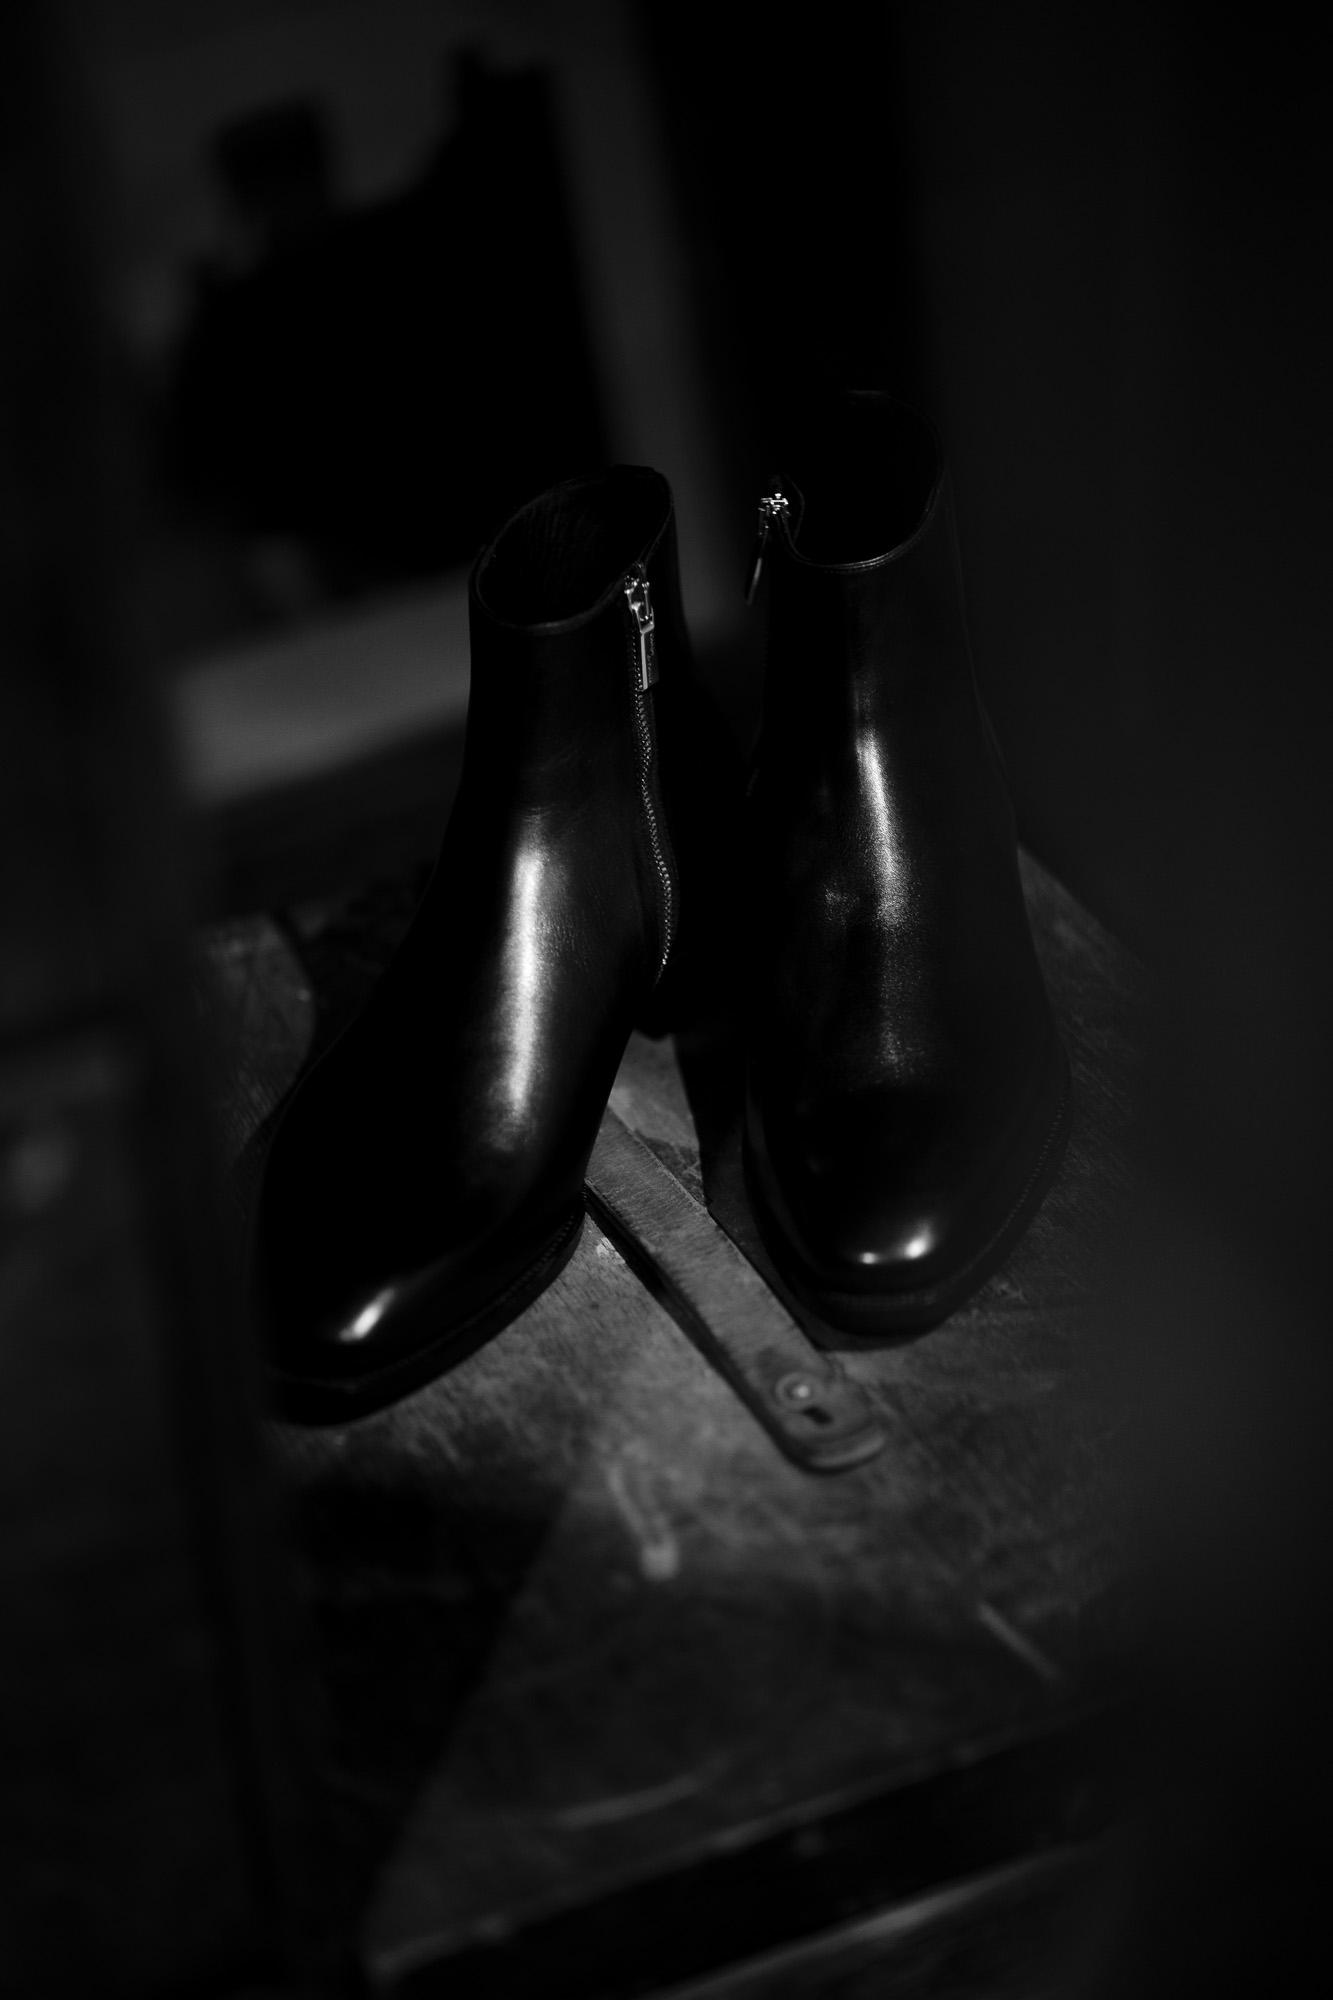 "Georges de Patricia ""Stradale""【Special Boots】 SF90 ストラダーレ フェラーリ PHEV ジョルジュドパトリシア ジップアップブーツ 925スターリングシルバー ブーツ 愛知 名古屋 Alto e Diritto altoediritto アルトエデリット"